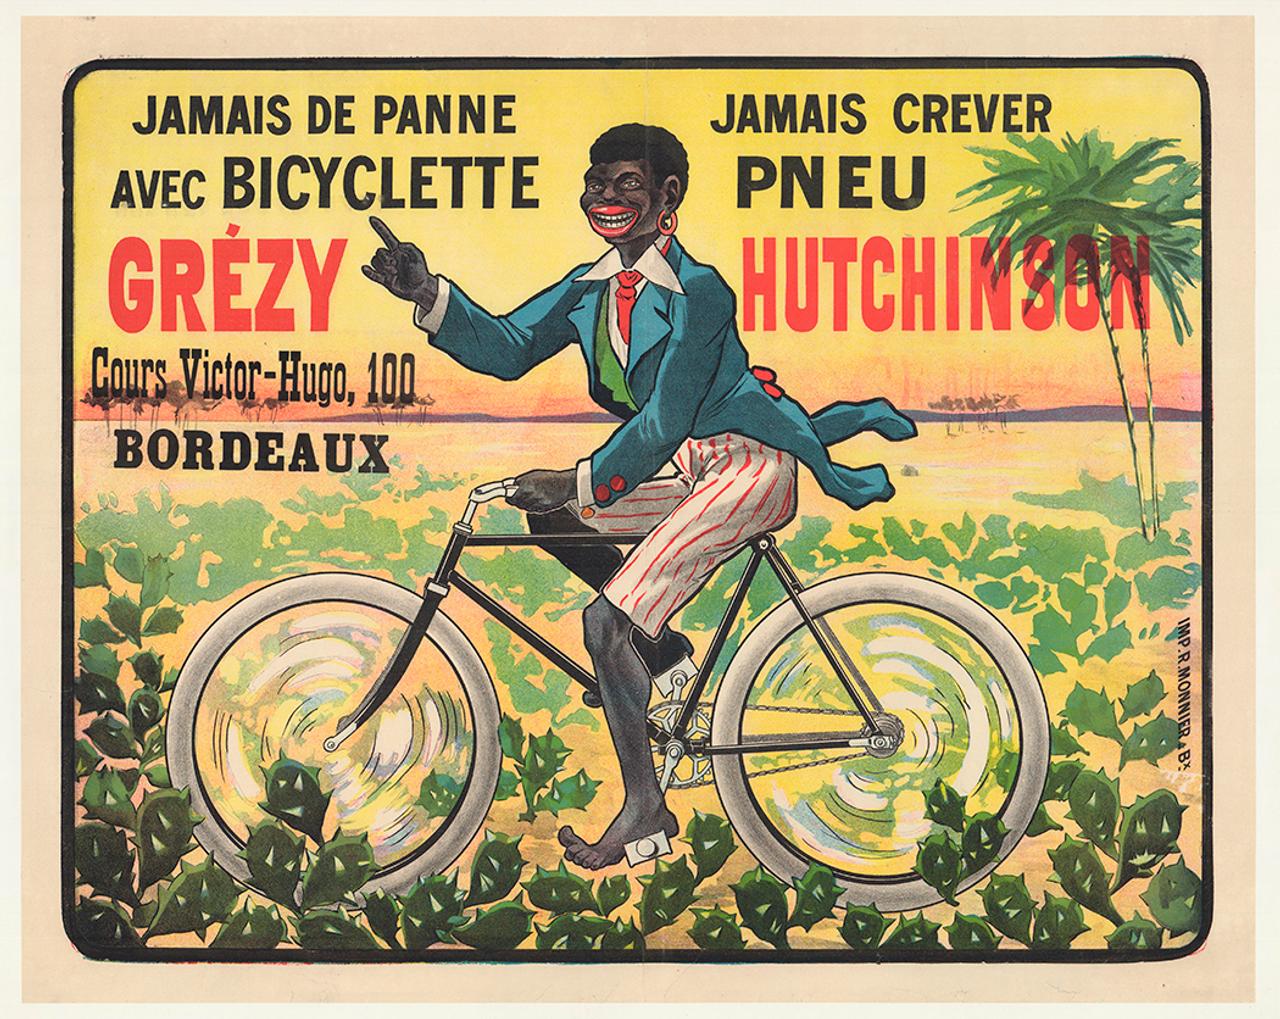 Grezy Hutchinson Original Vintage Bicycle Poster